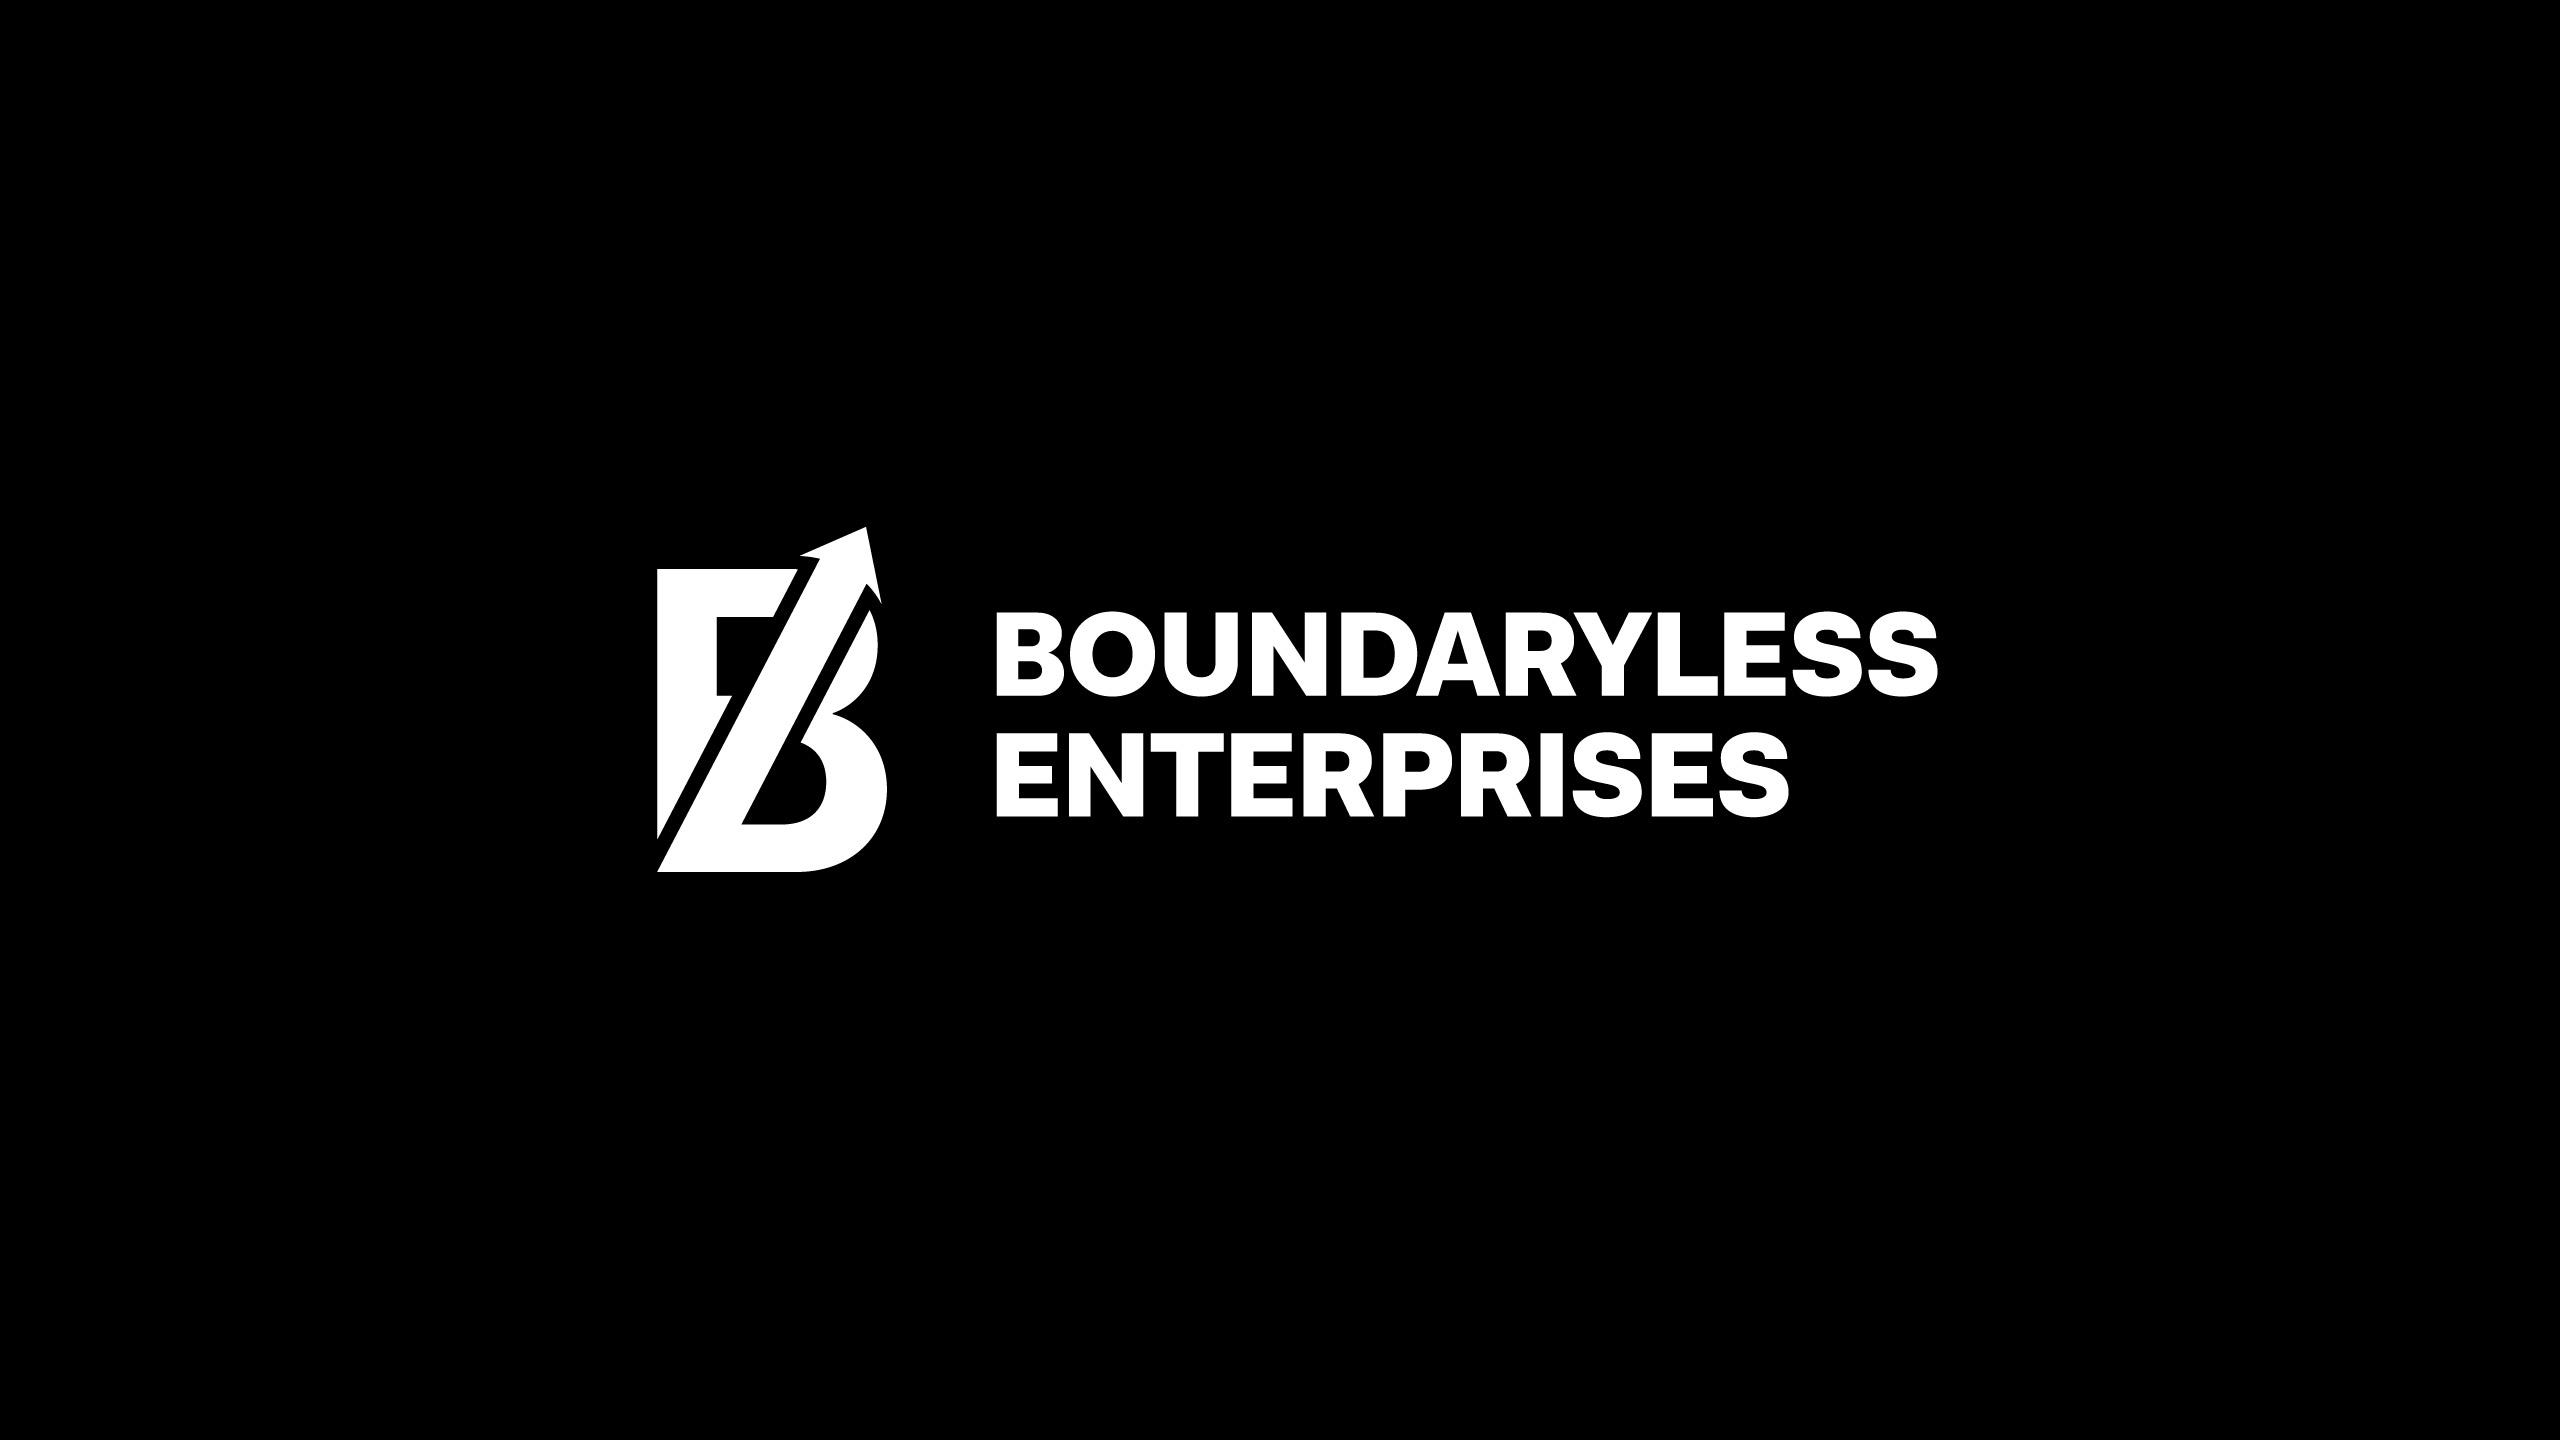 Boundaryless Enterprises logo design